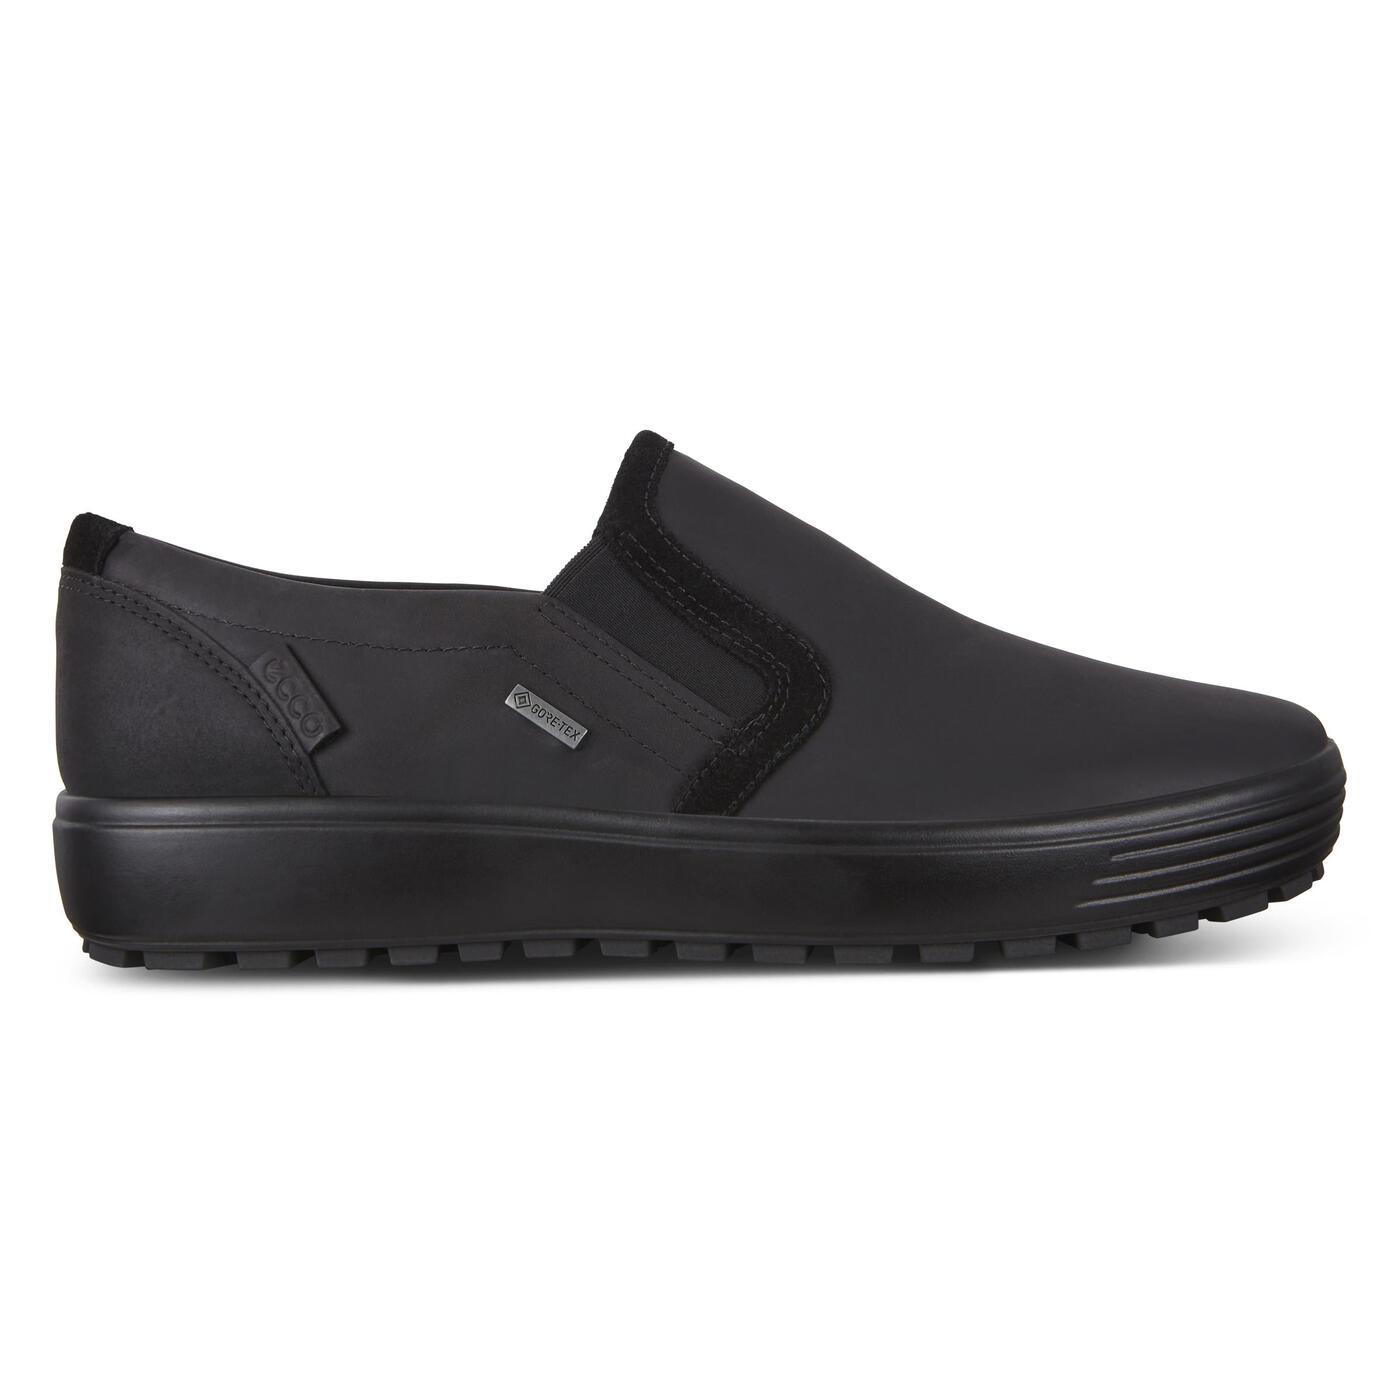 ECCO SOFT 7 TRED Men's Sneaker